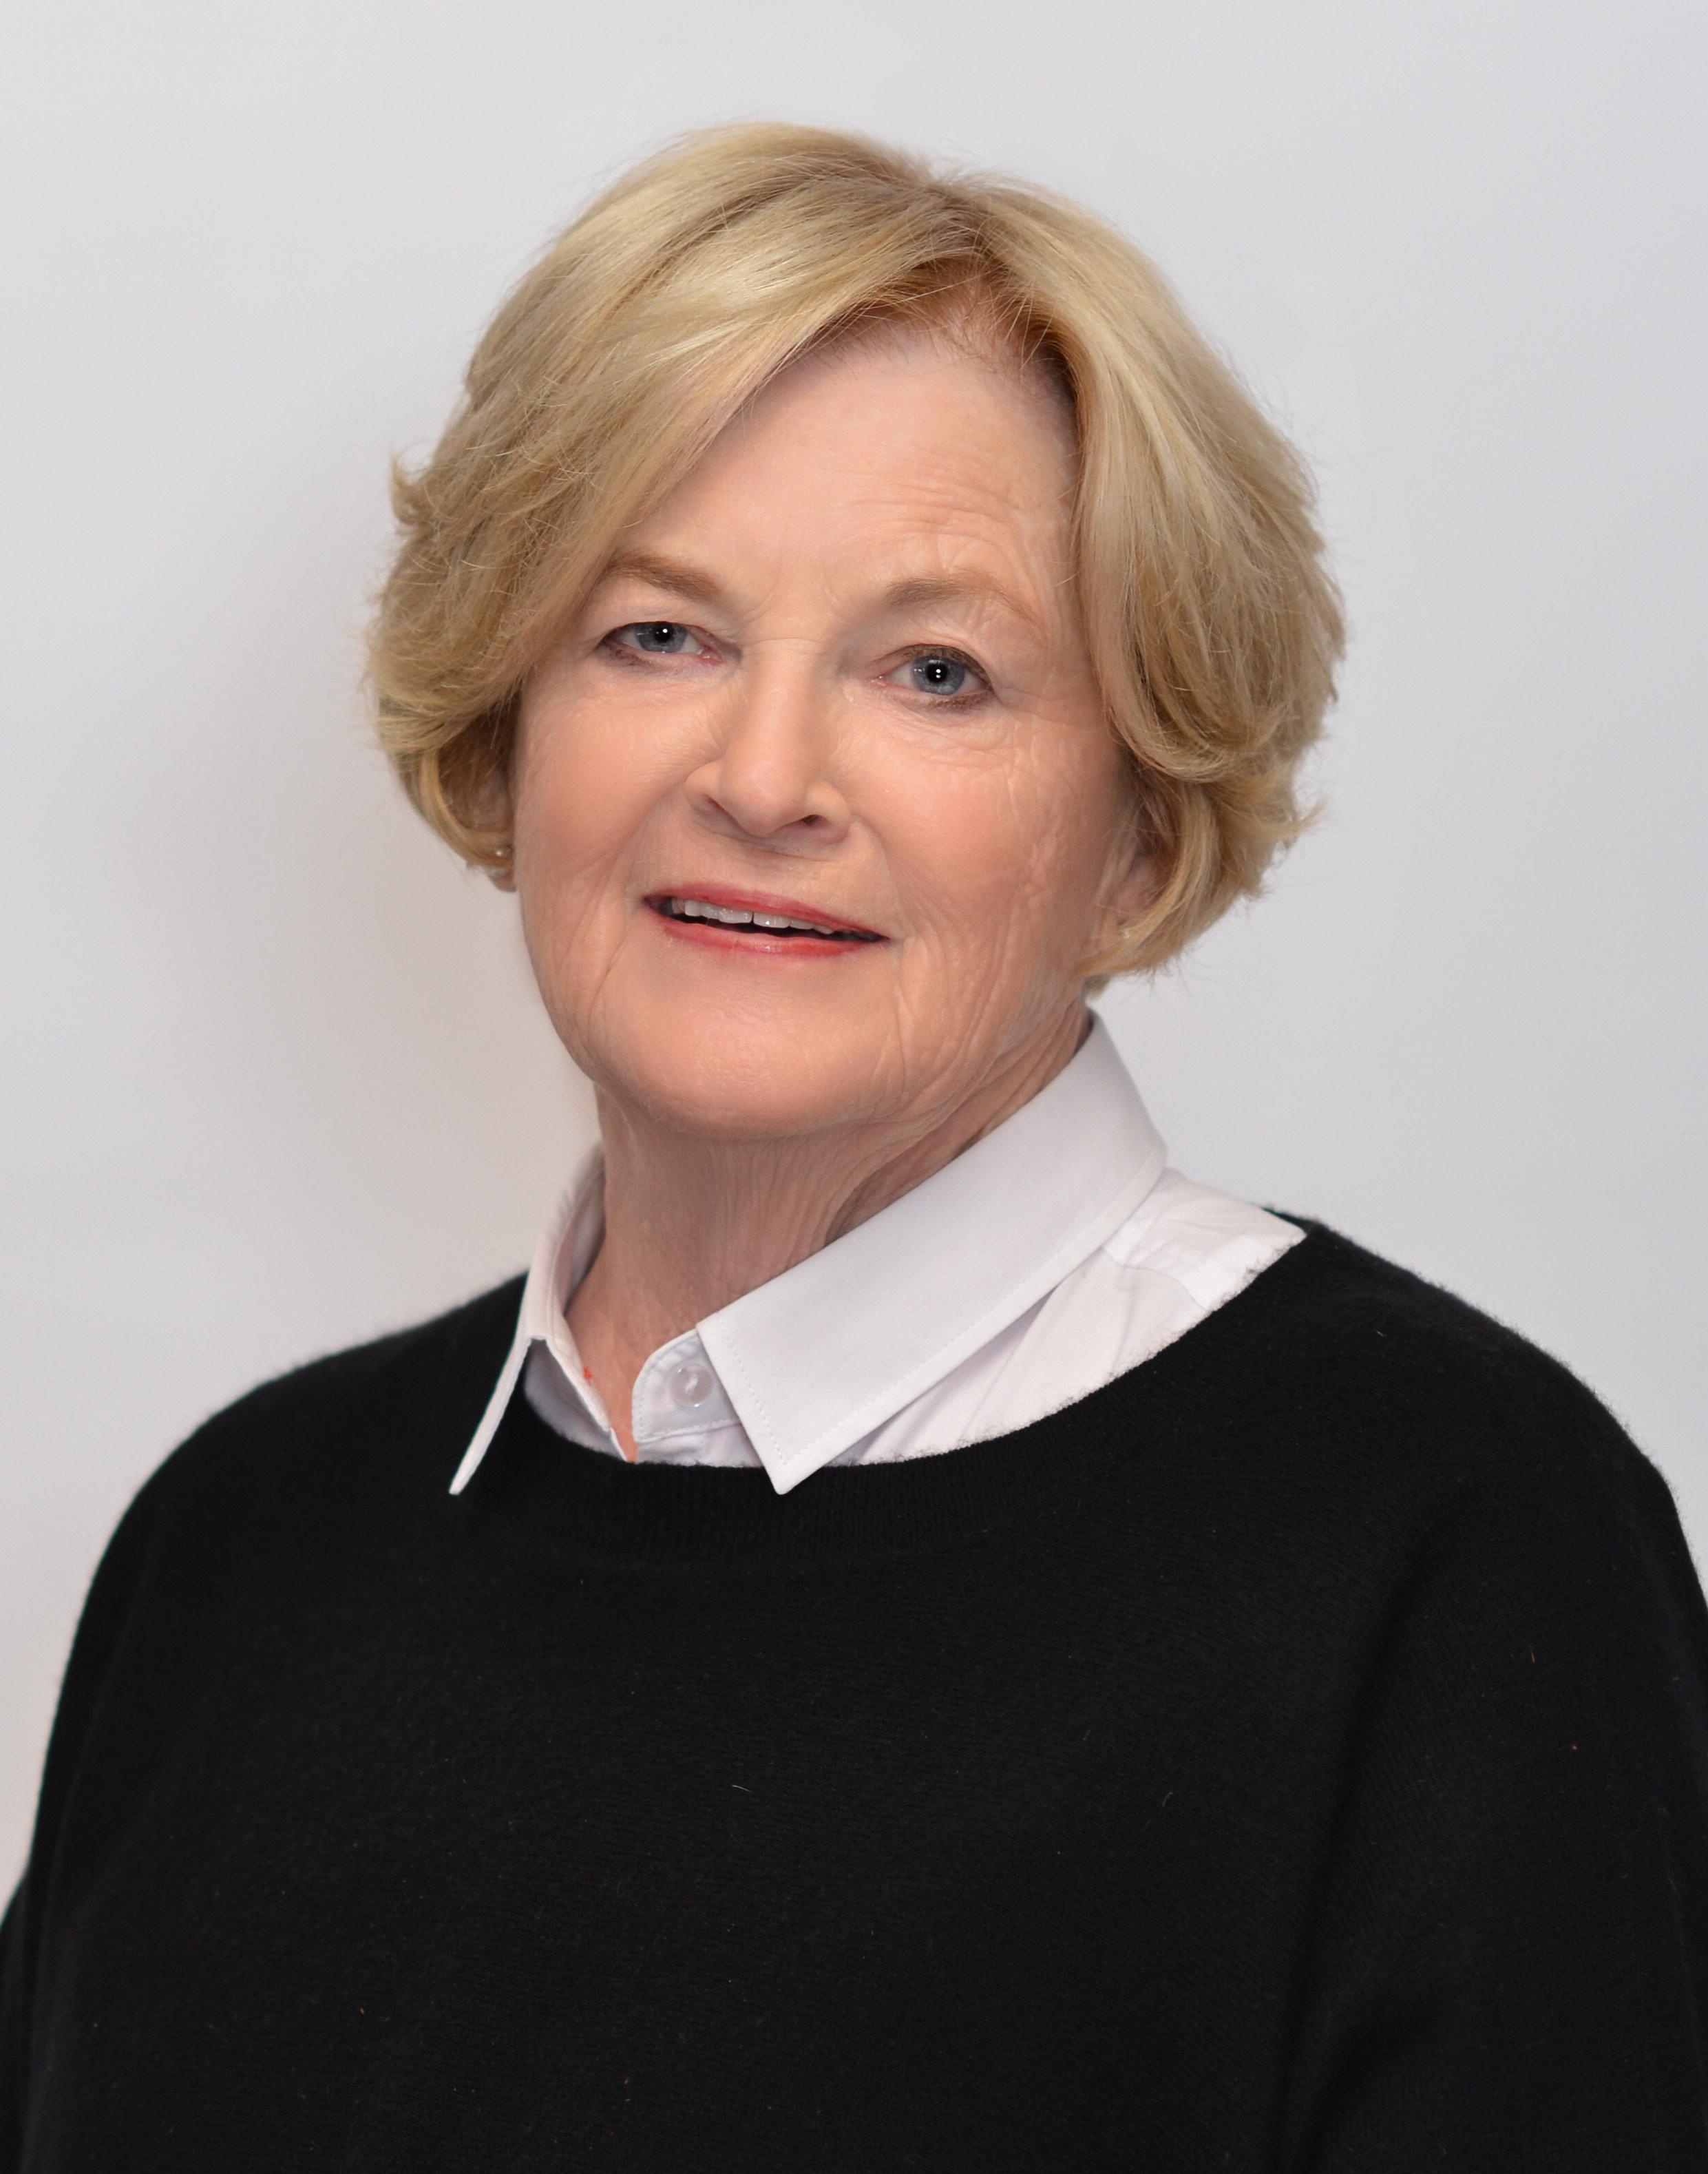 Christine Keaney